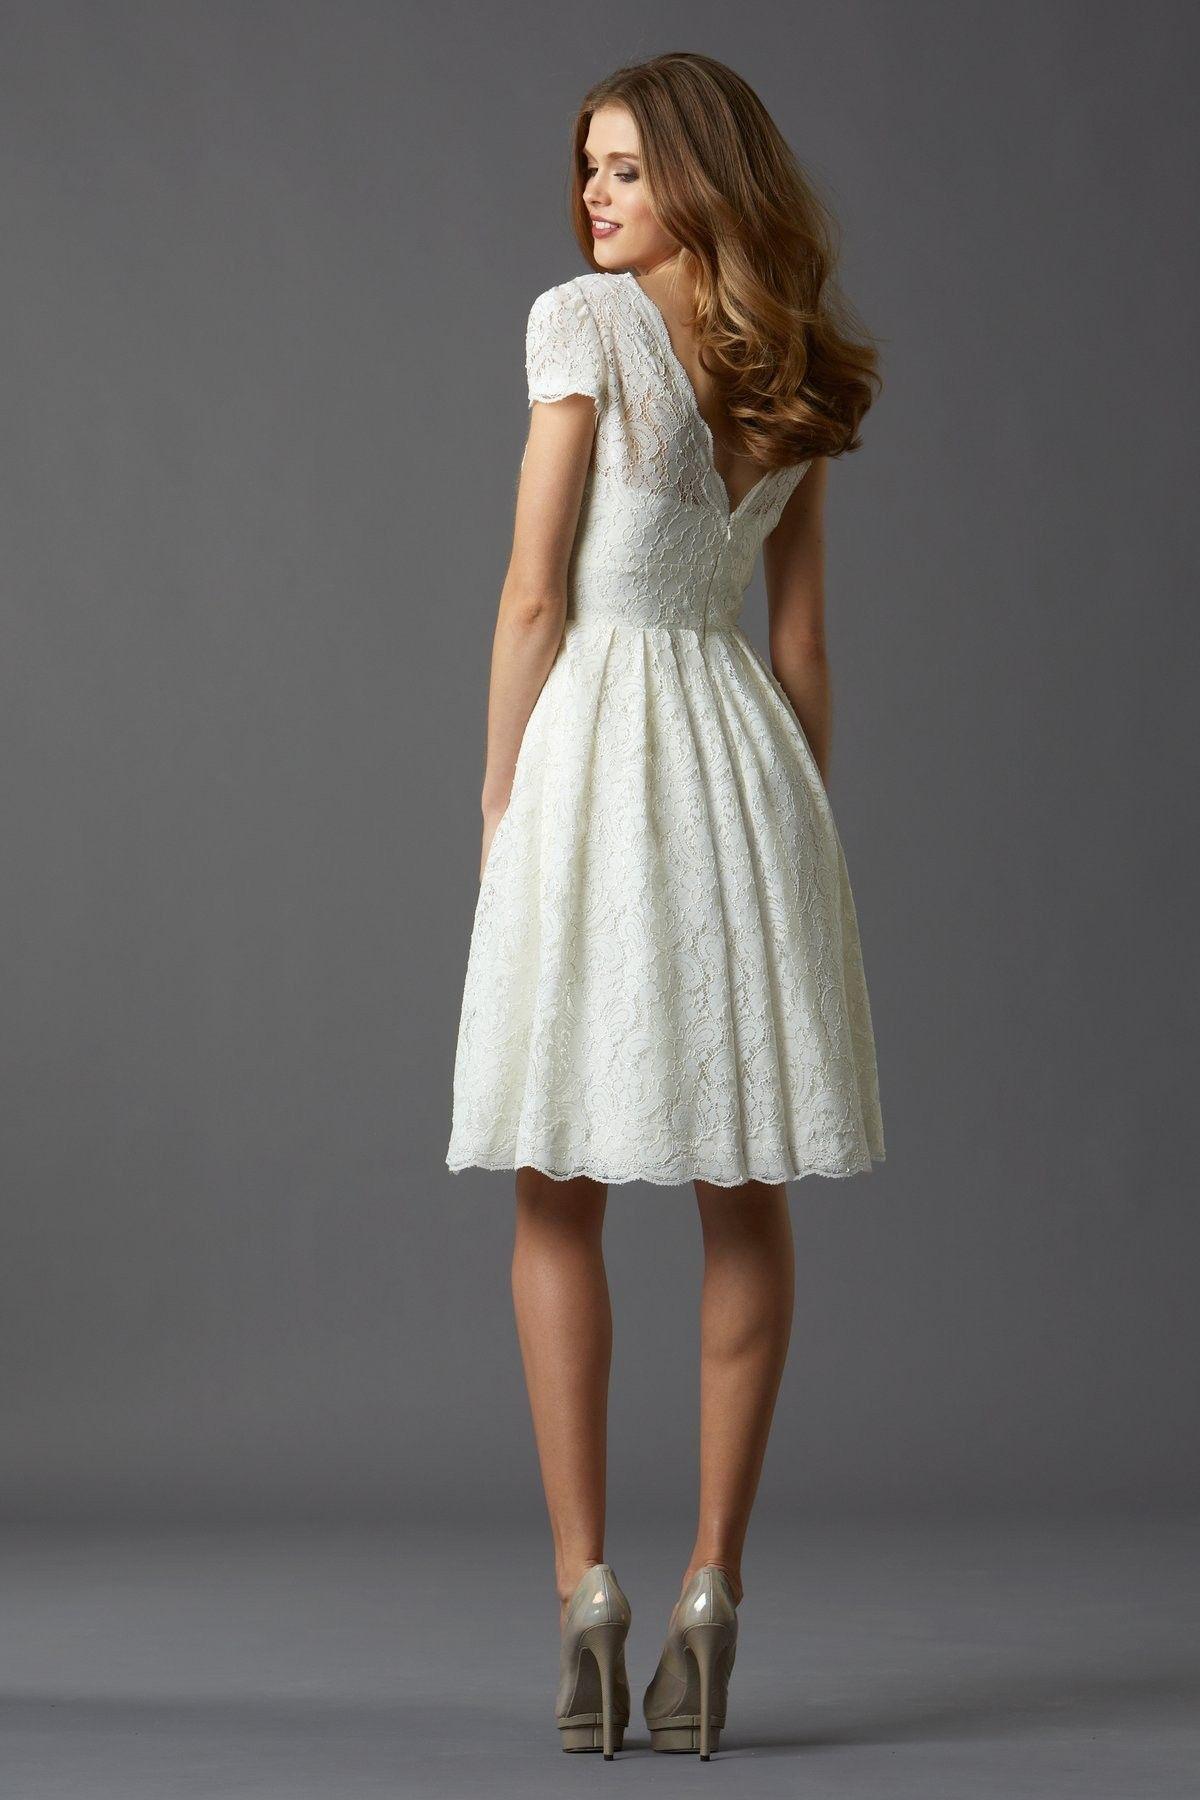 Short Sleeve Tank Top Knee Length Lace A Line Wedding Dress Awa0002 ...